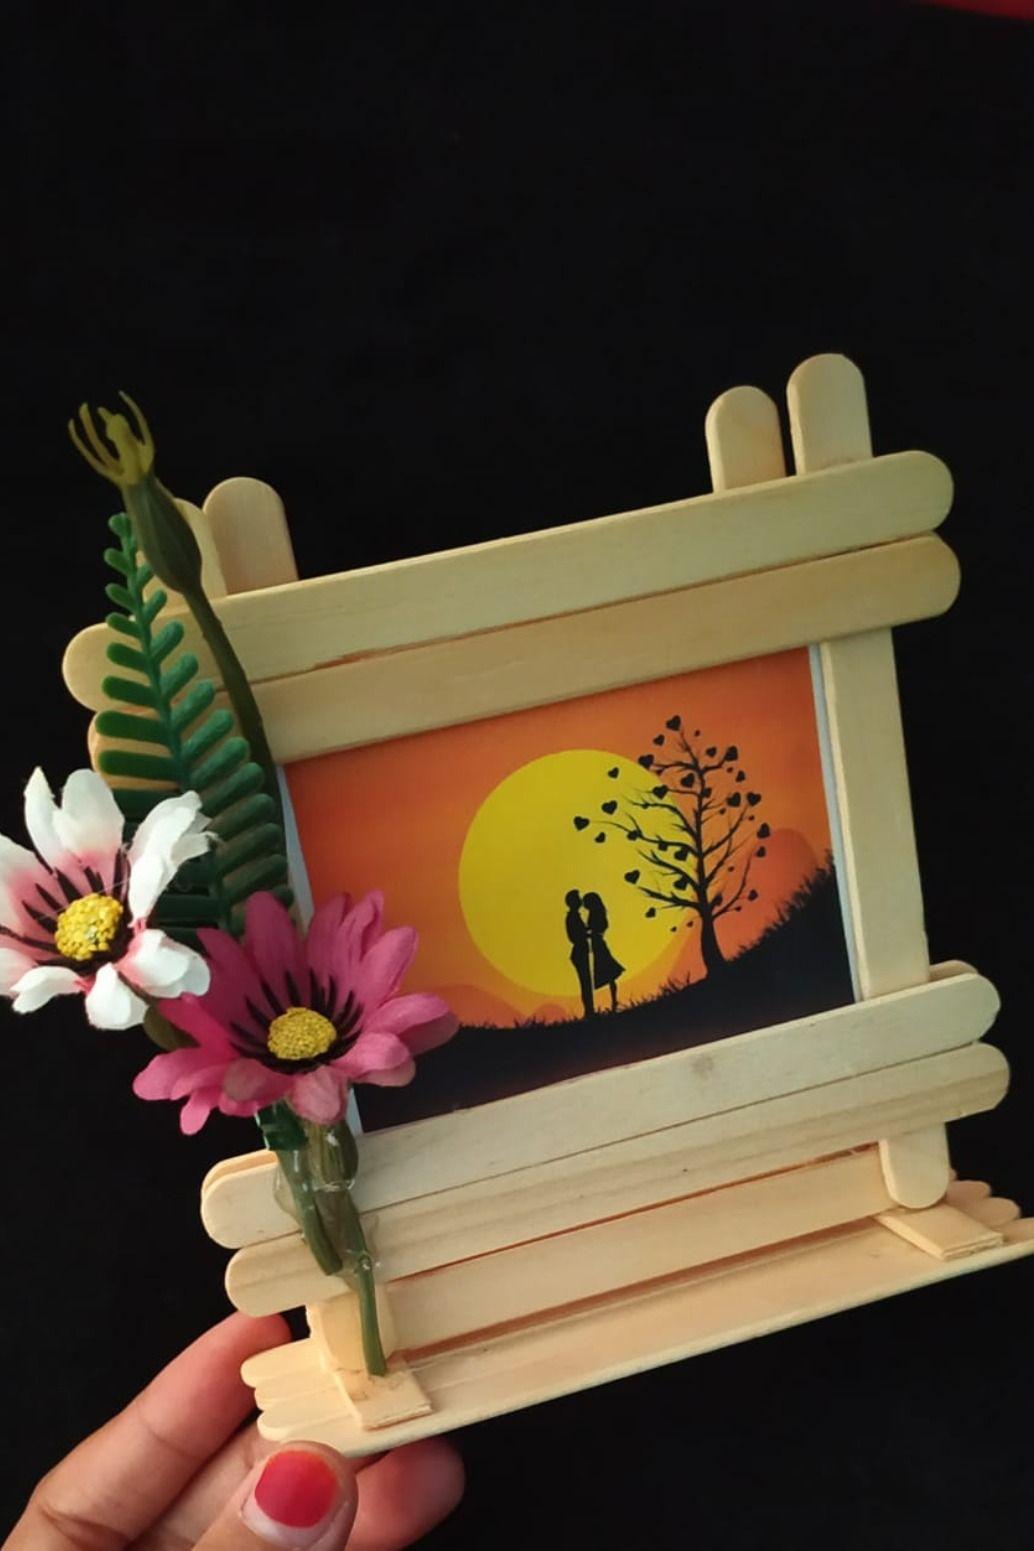 Popsicle Stick Frame Kreatif Wallpaper Ponsel Minion Ide Dekorasi Frame dari stik es krim